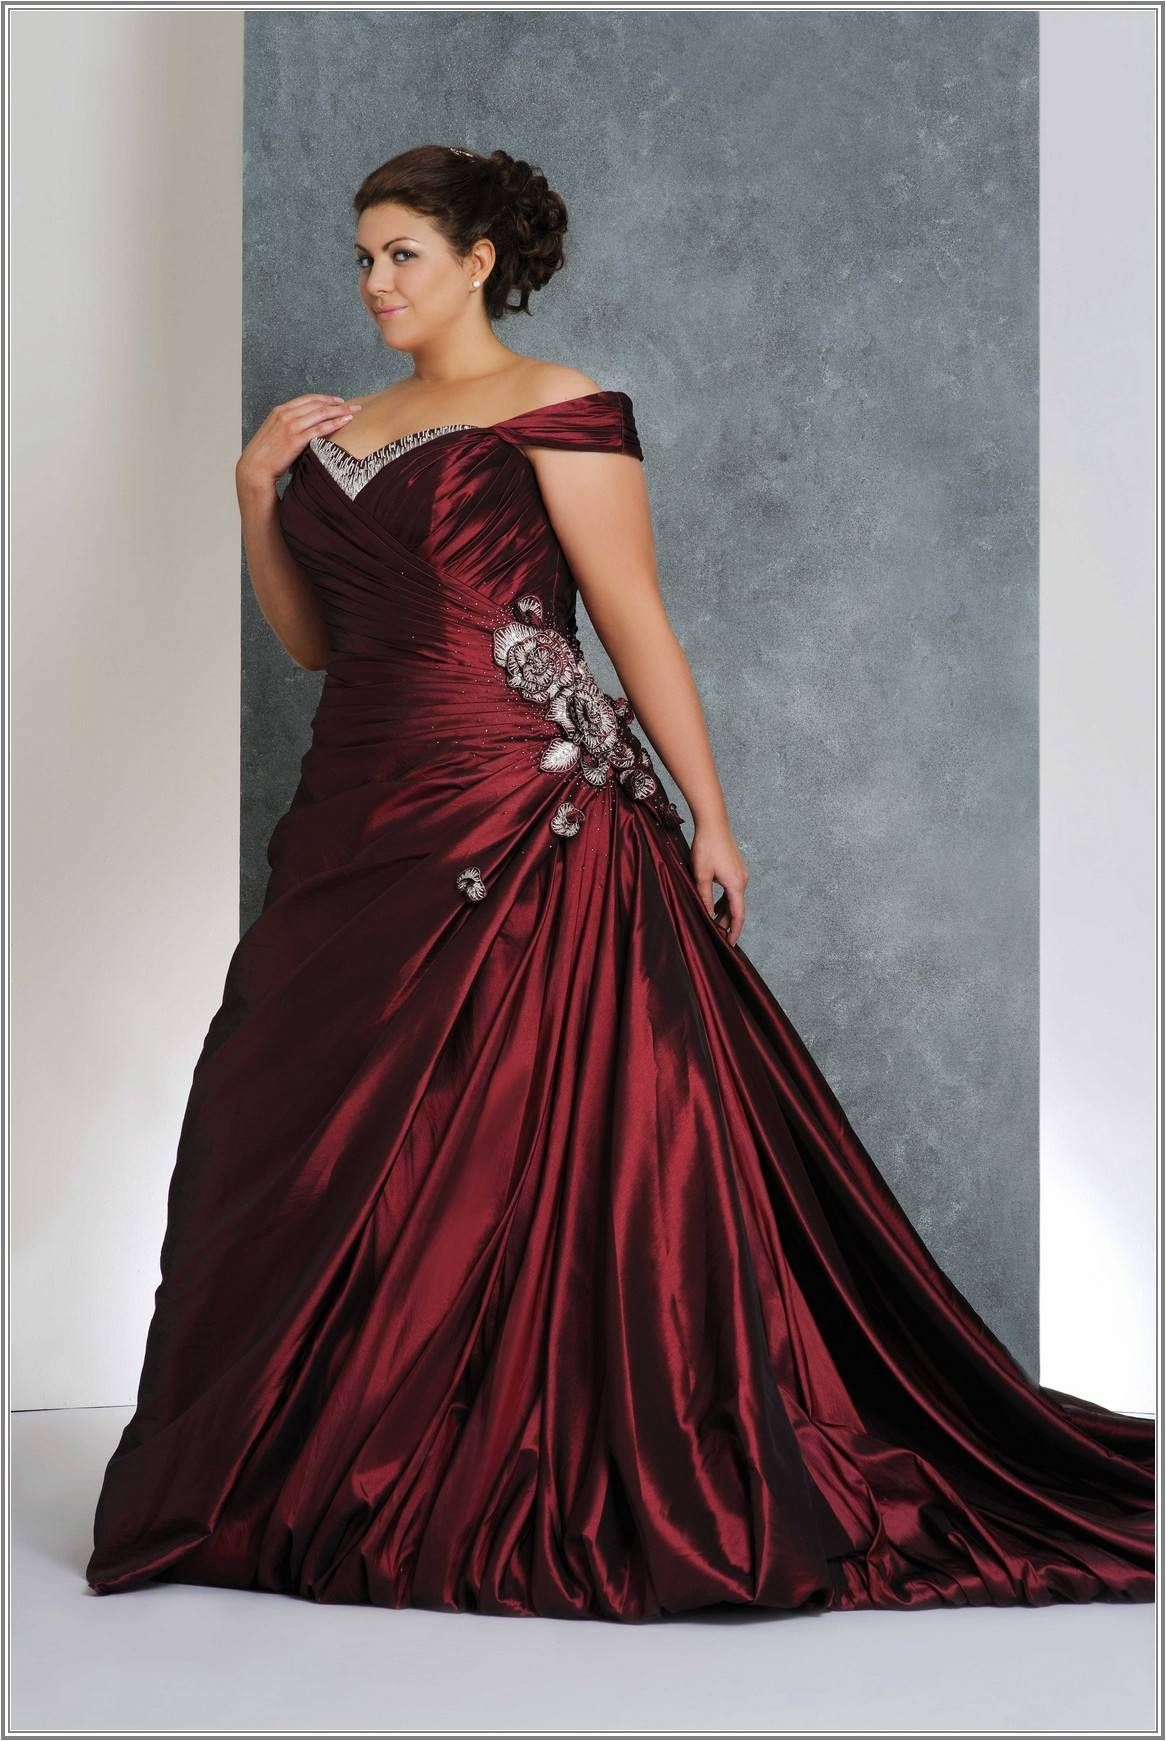 Plus size bling wedding dresses  Wedding Make You Feel Like a Princess by Wearing Wedding Dresses